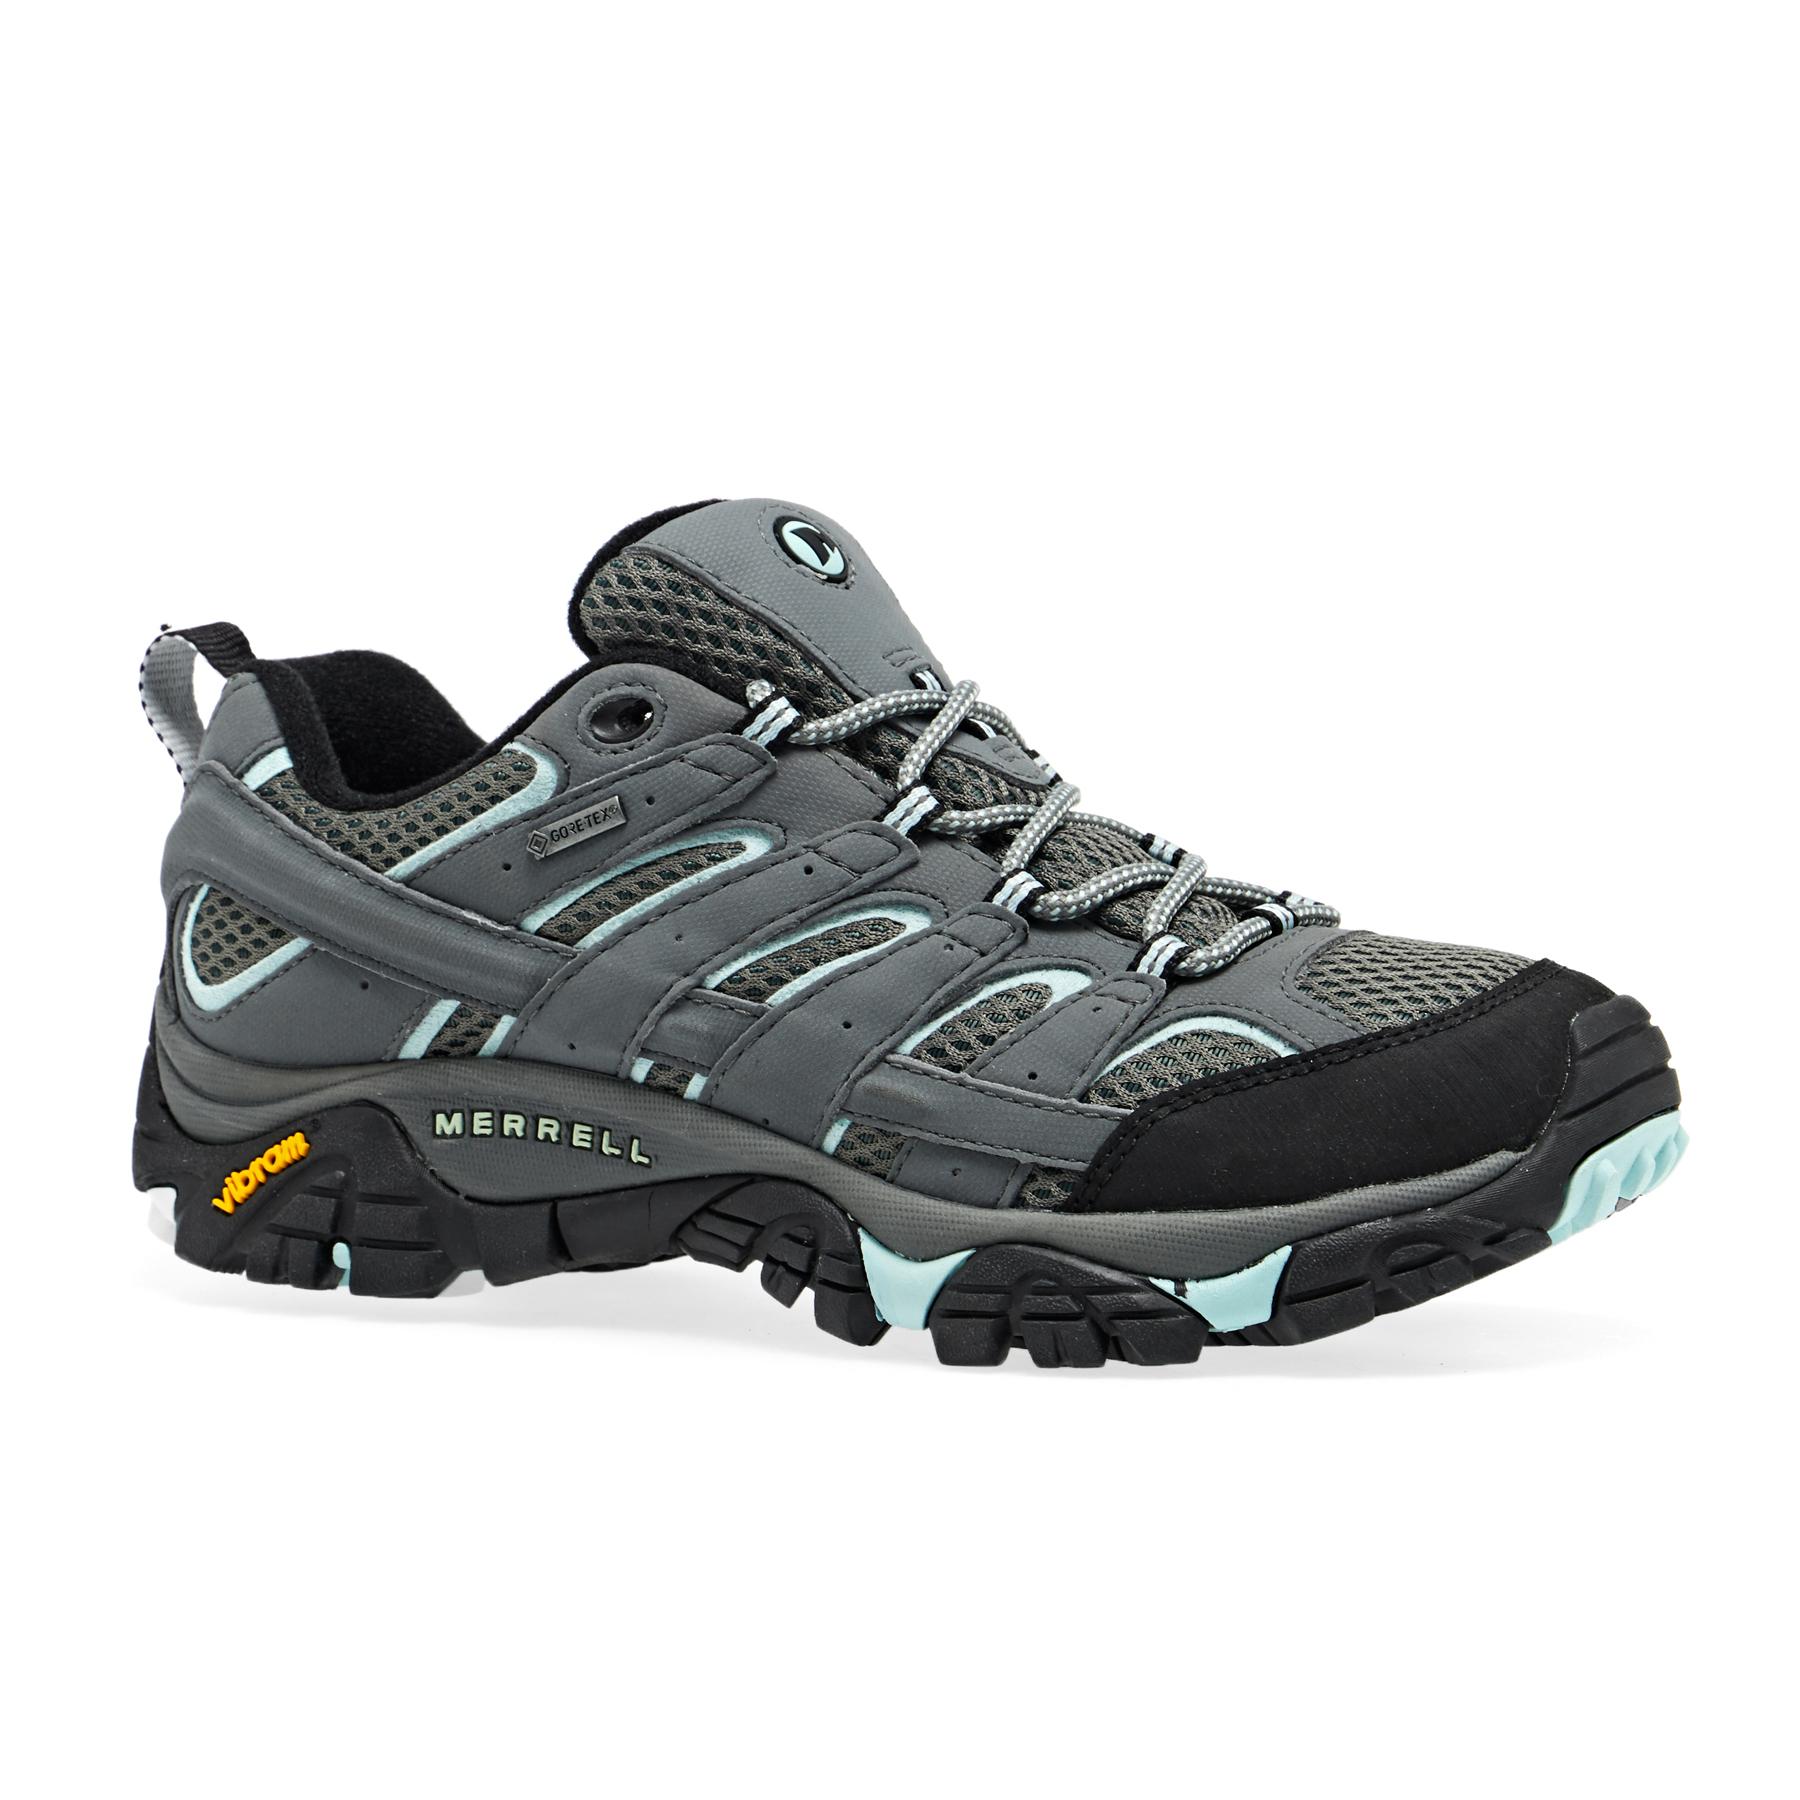 merrell shoes hk uk